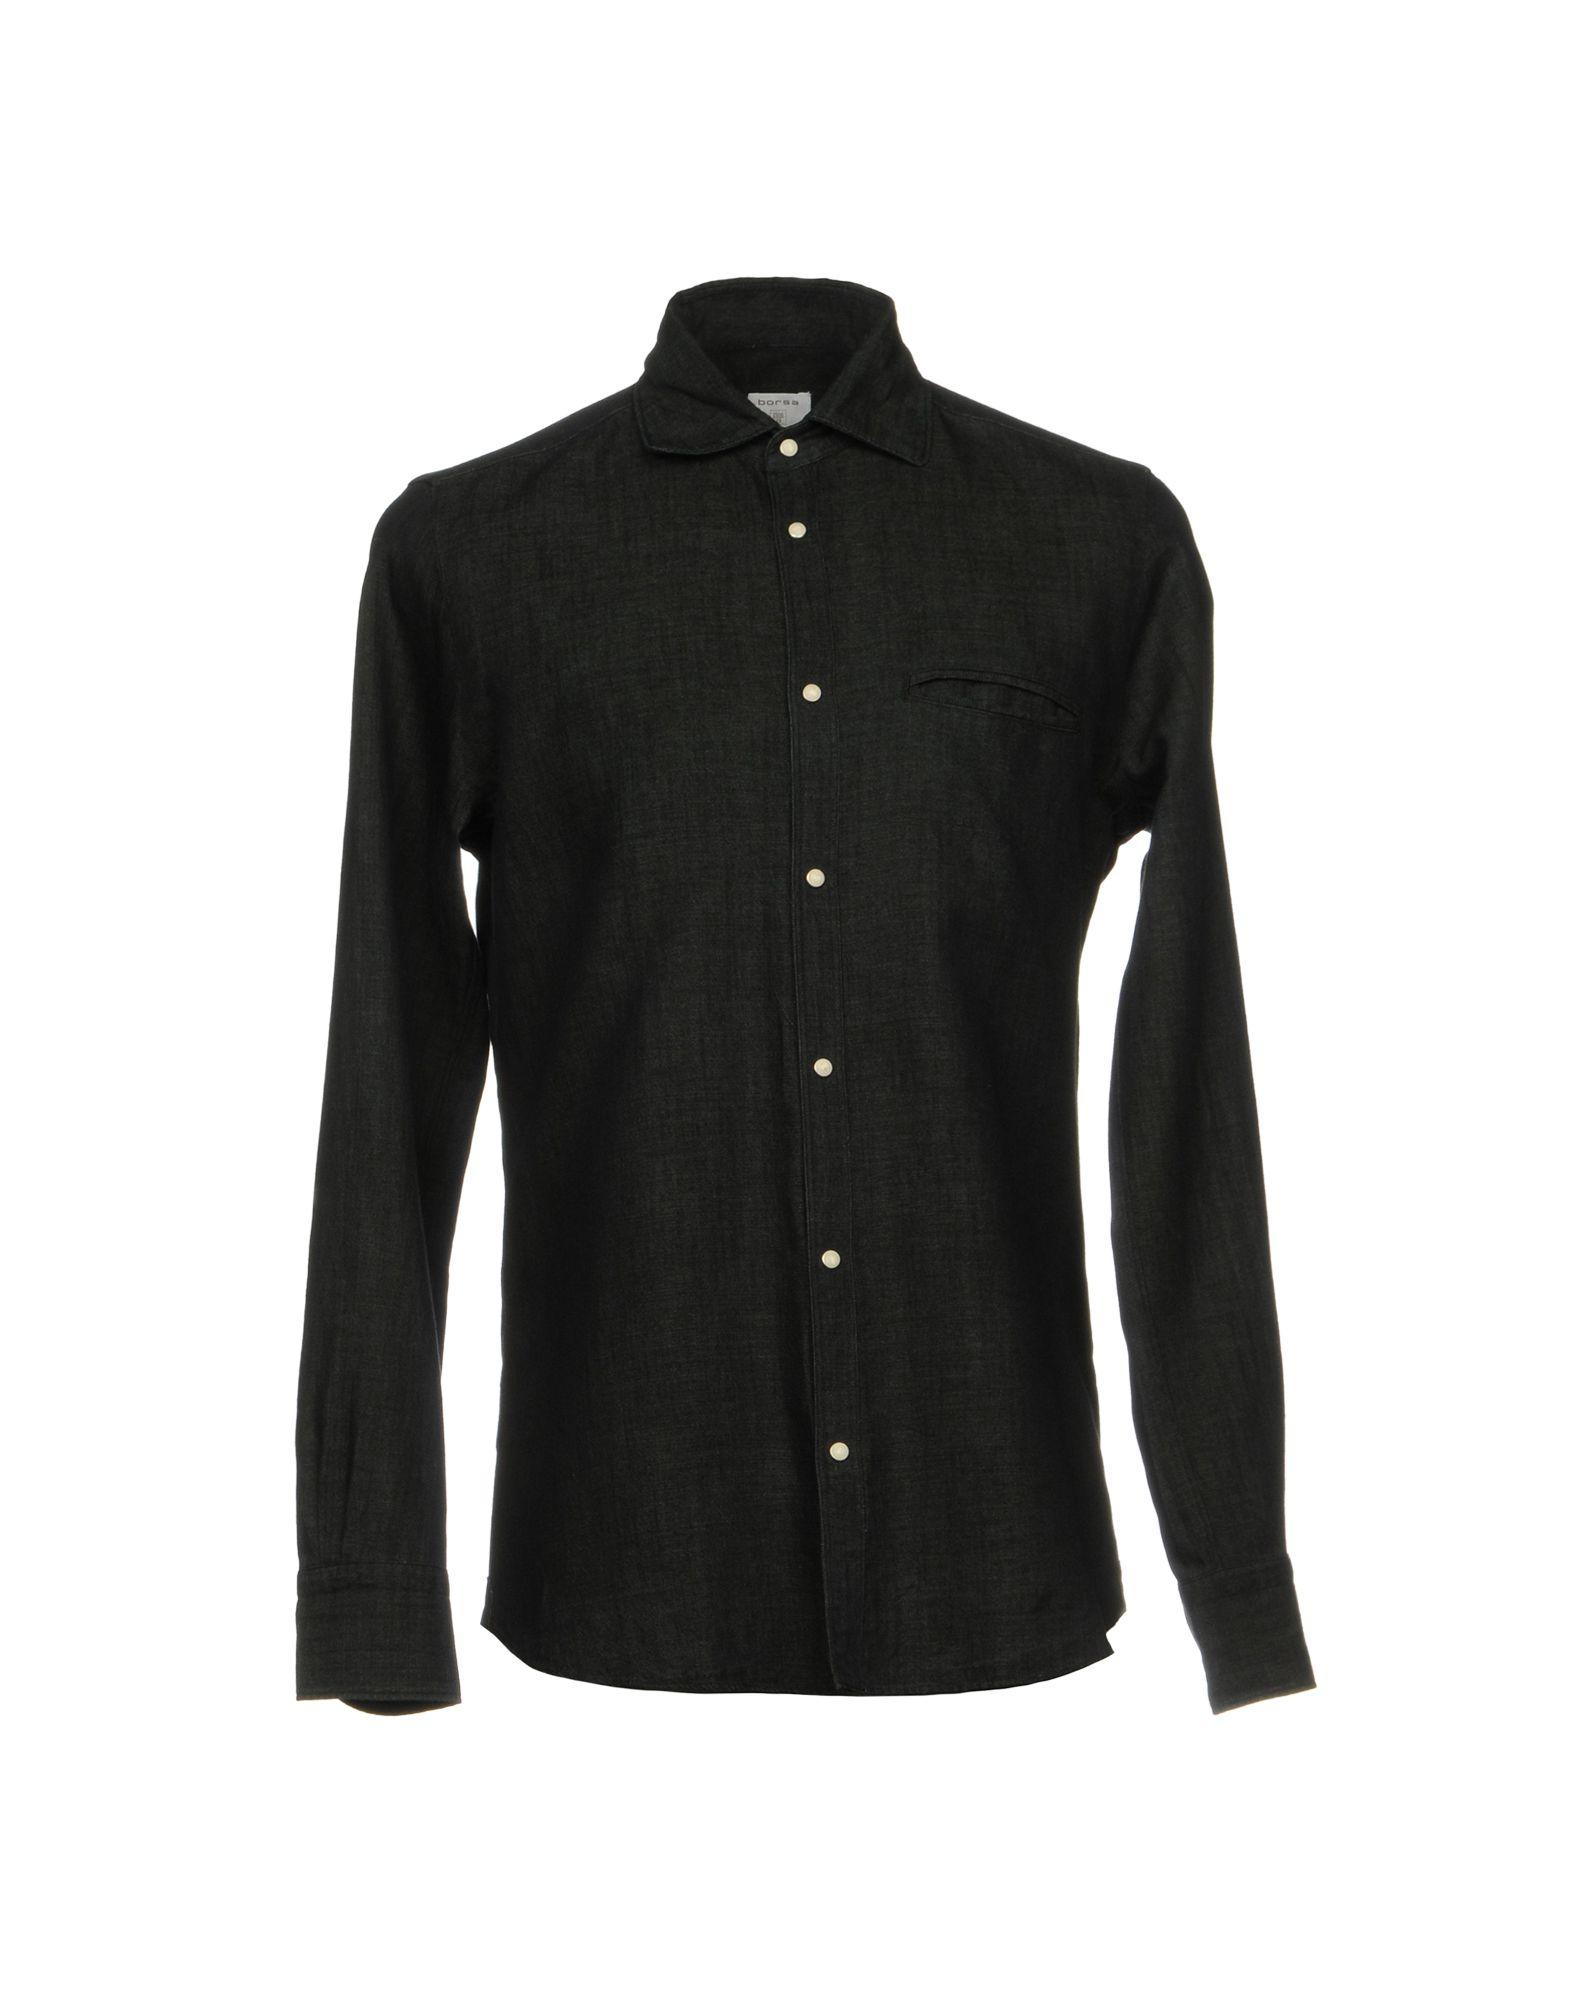 BORSA Джинсовая рубашка джинсовая рубашка quelle arizona 610860